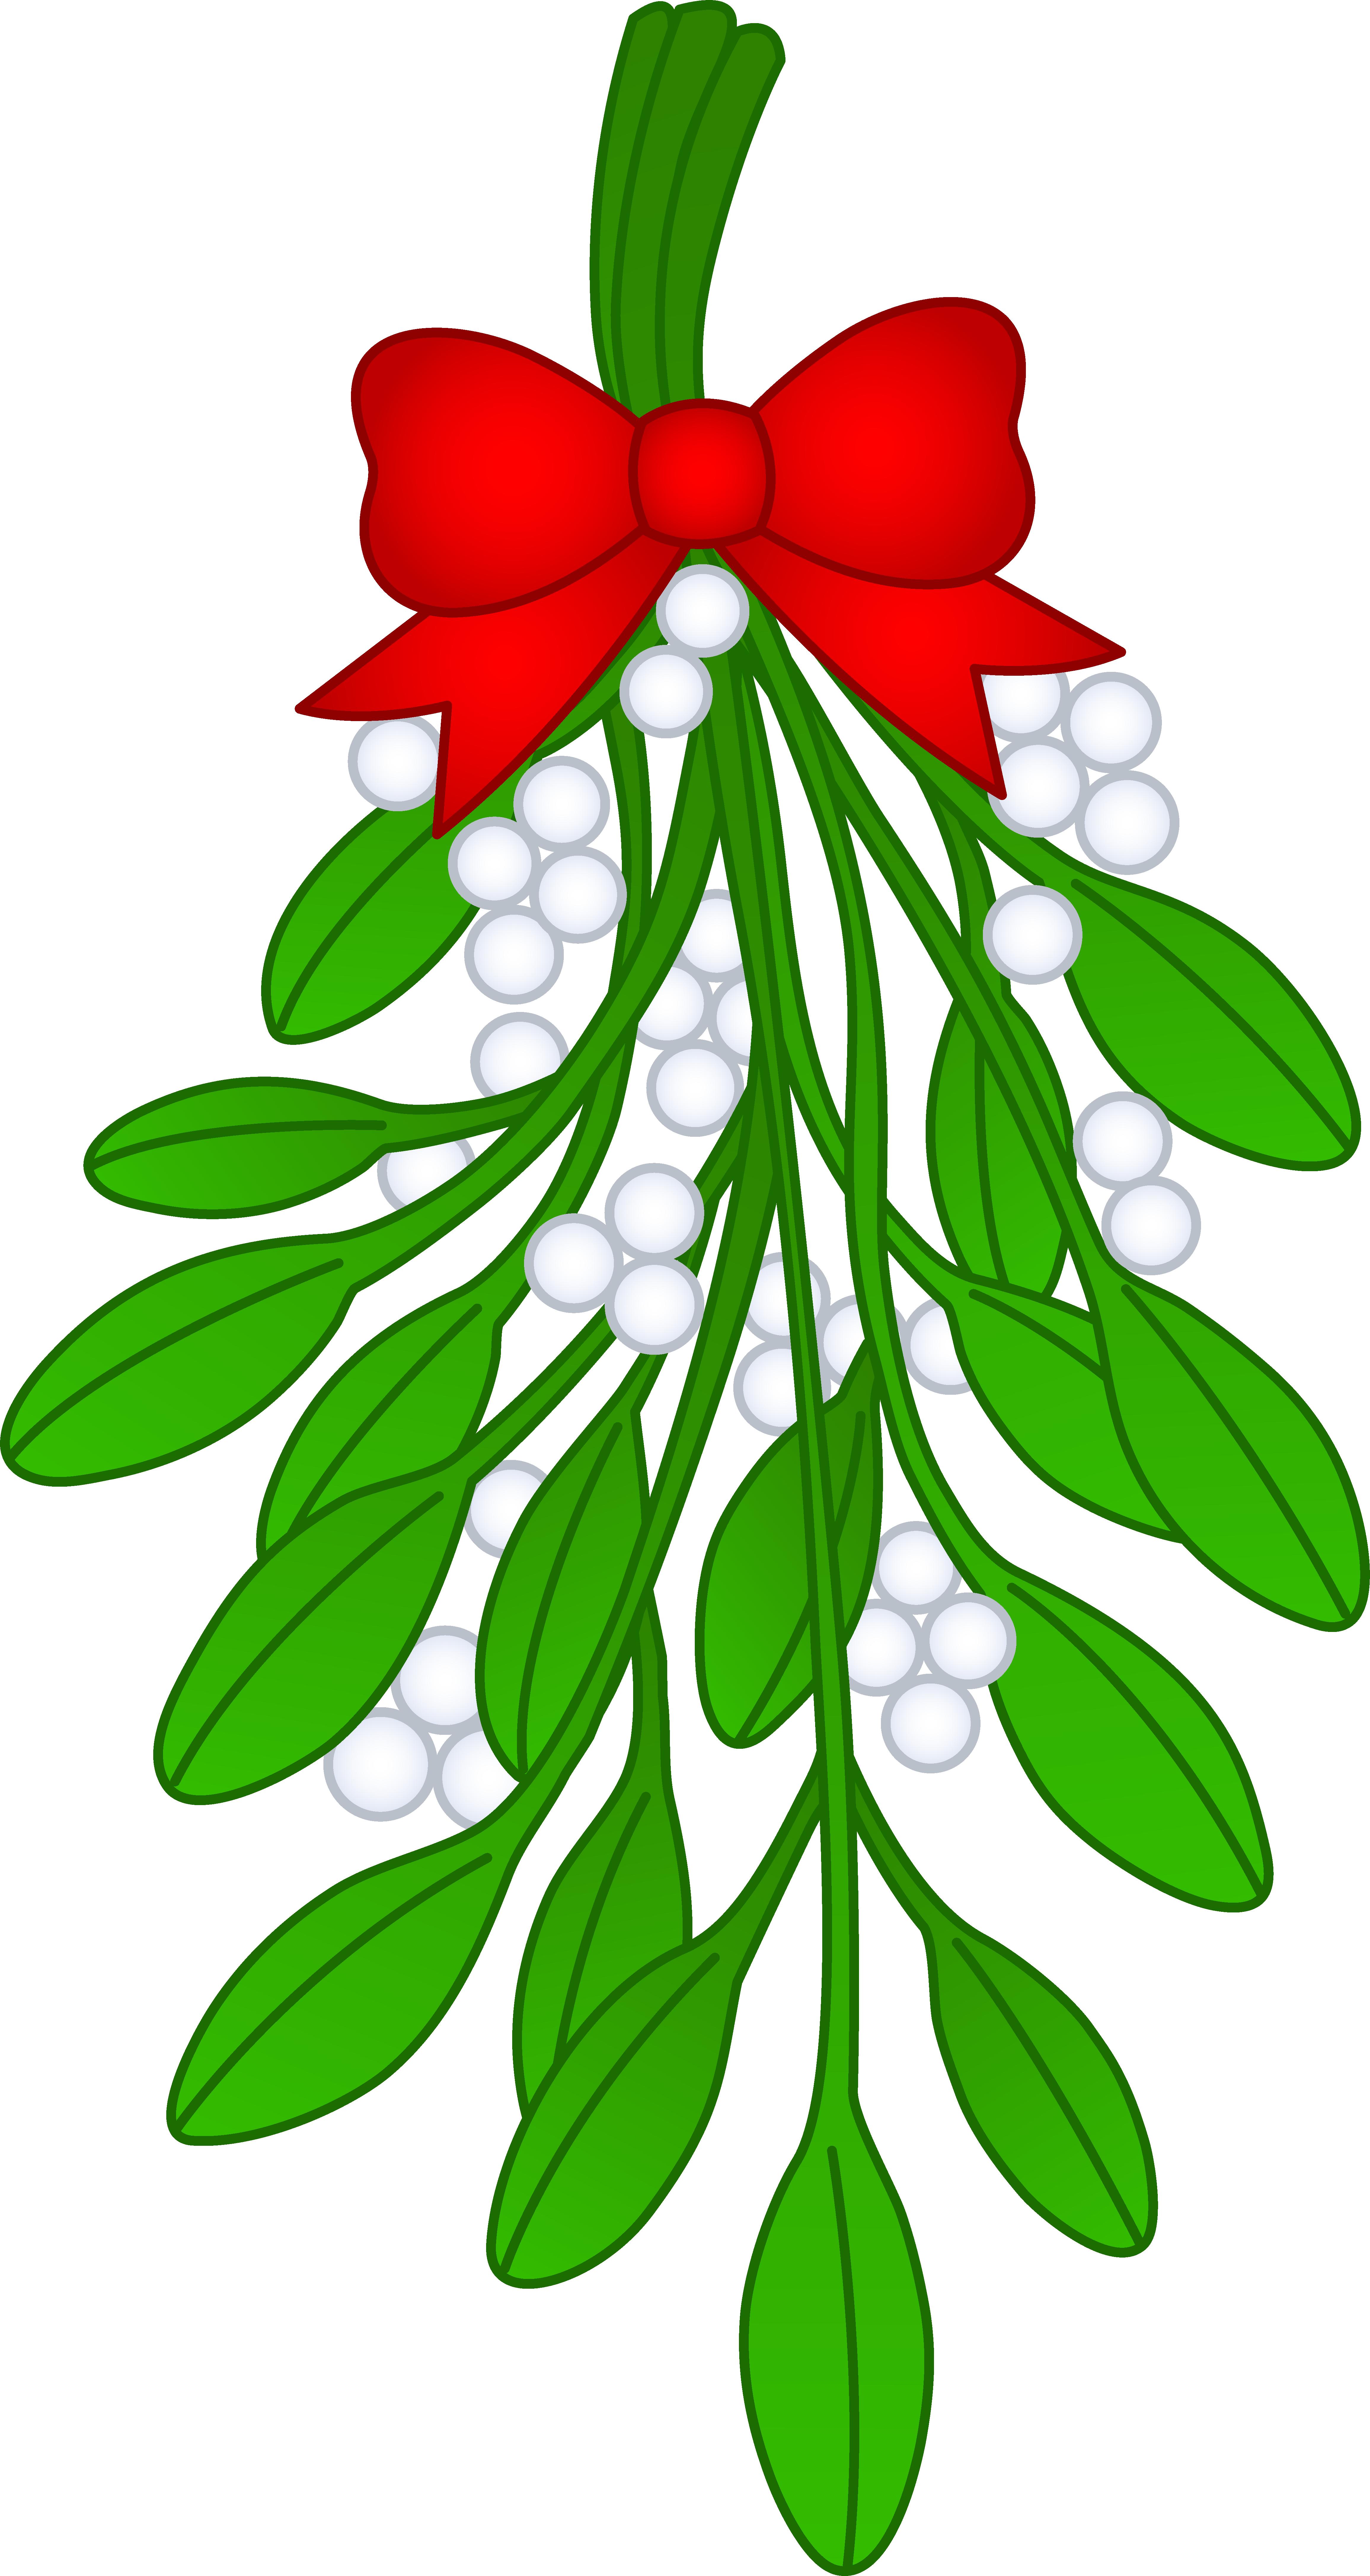 Christmas kiss clipart clip art royalty free library Mistletoe Drawing | Mistletoe Drawing | crafts | Pinterest ... clip art royalty free library